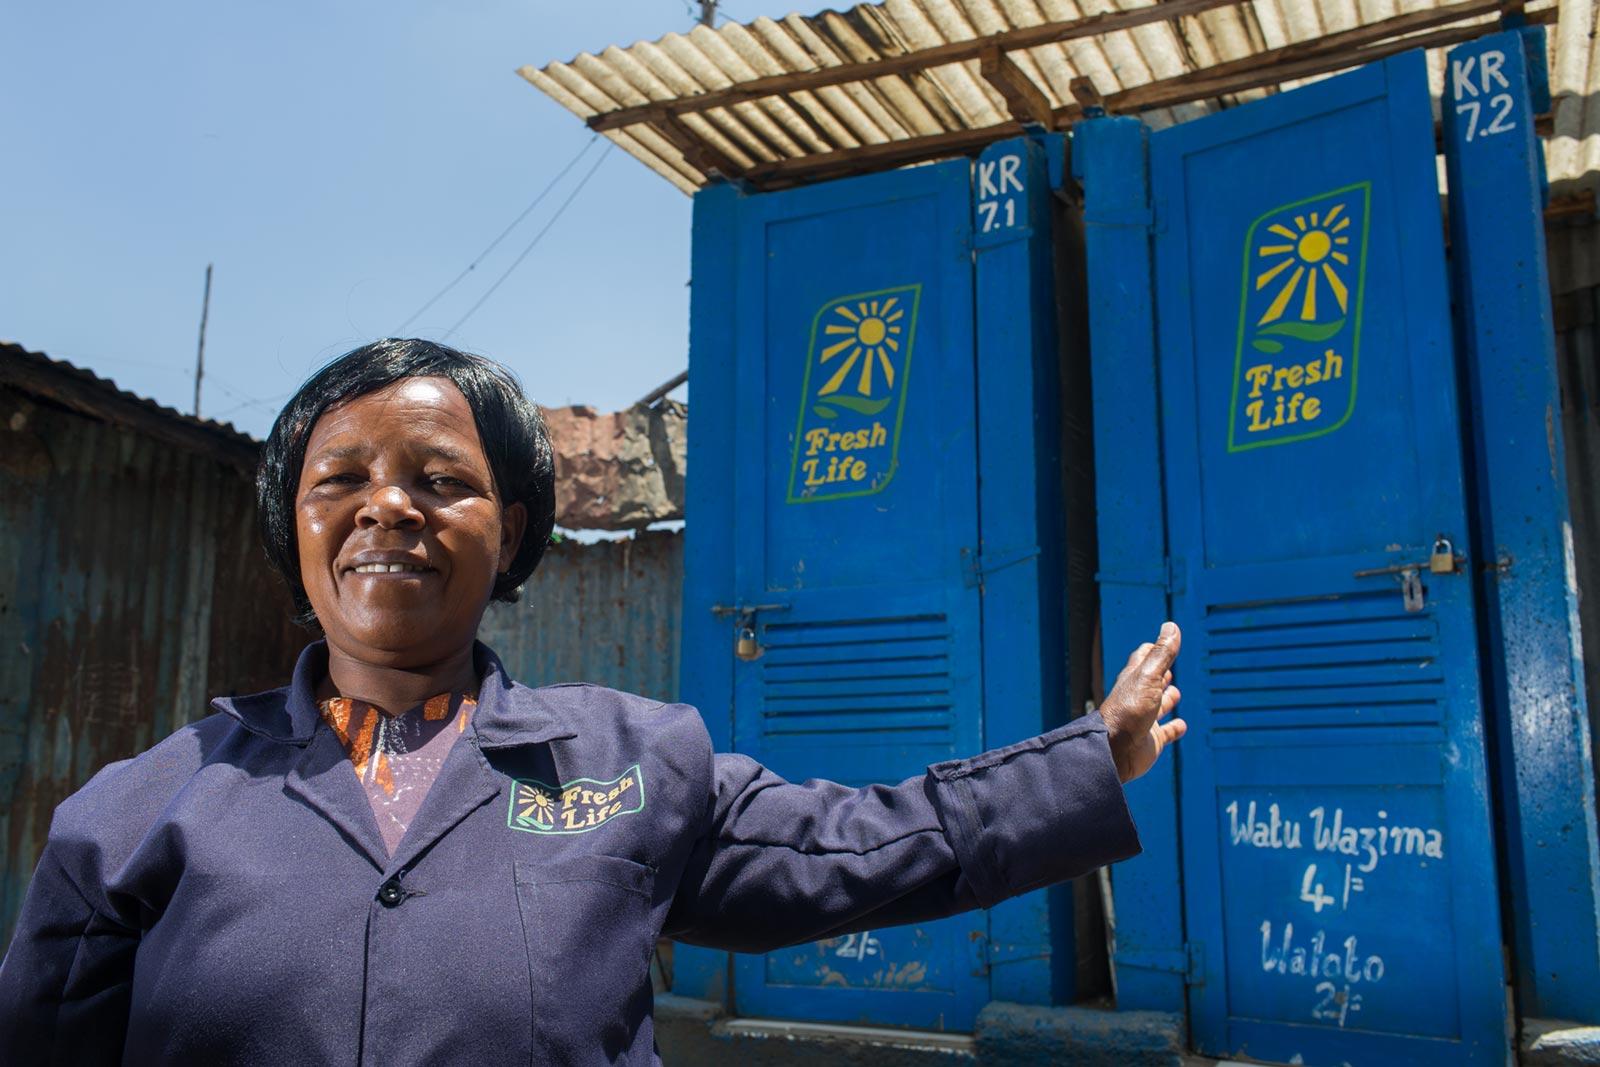 Fresh Life Operator Esther Munyiva has run her Fresh Life Toilets in Mukuru kwa Reuben slum since 2012. She is one of over 400 Fresh Life Operators running Fresh Life Toilets throughout Nairobi's informal settlements. Image Credit: Will Swanson